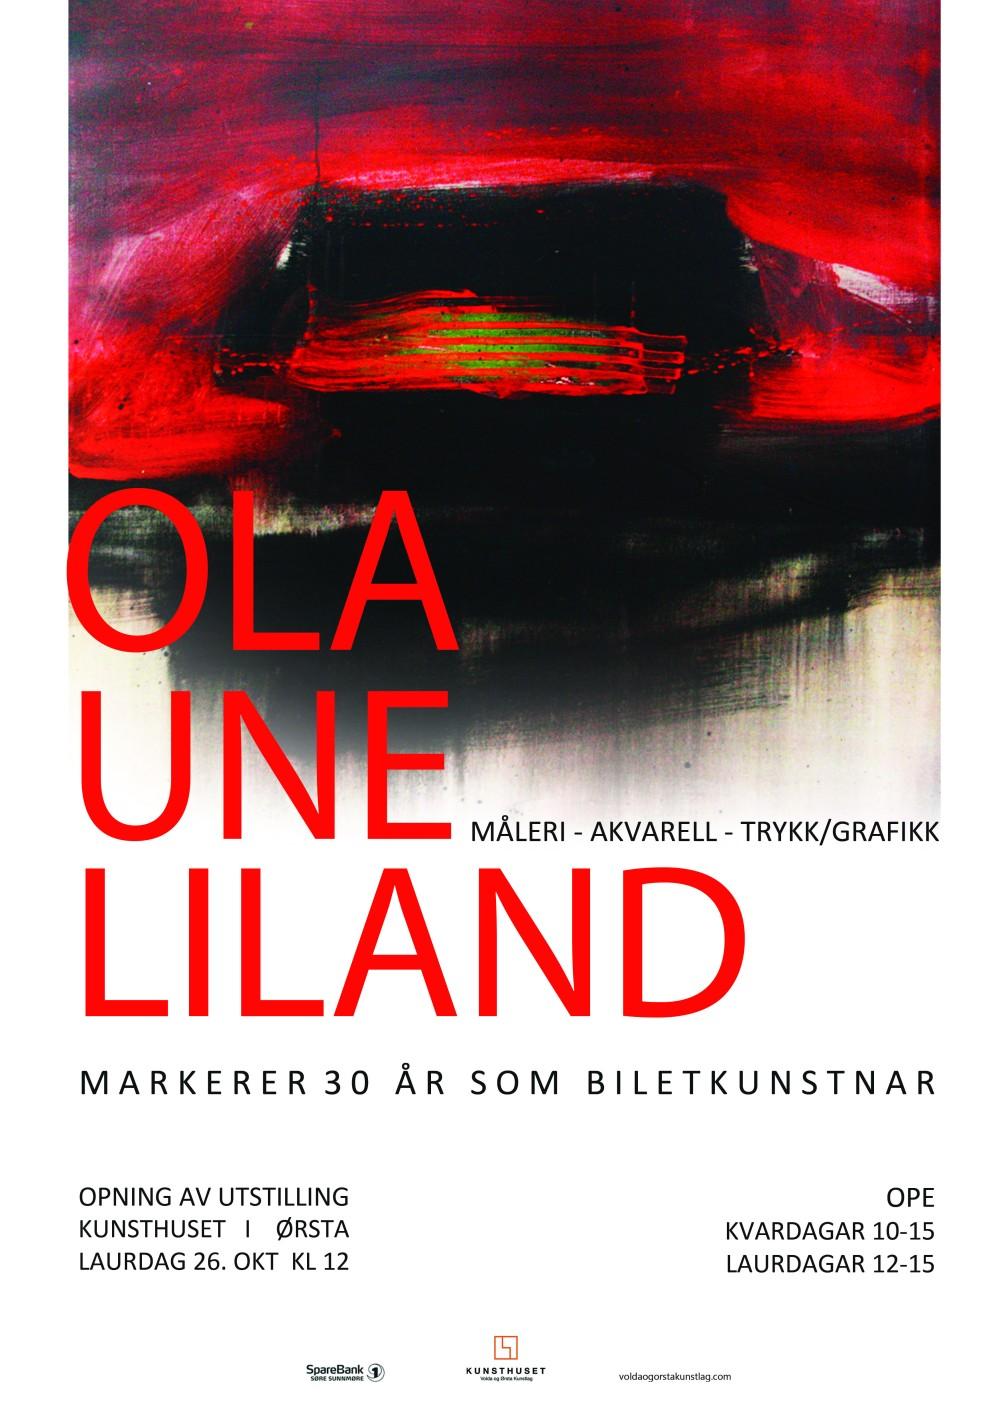 ola liland 2